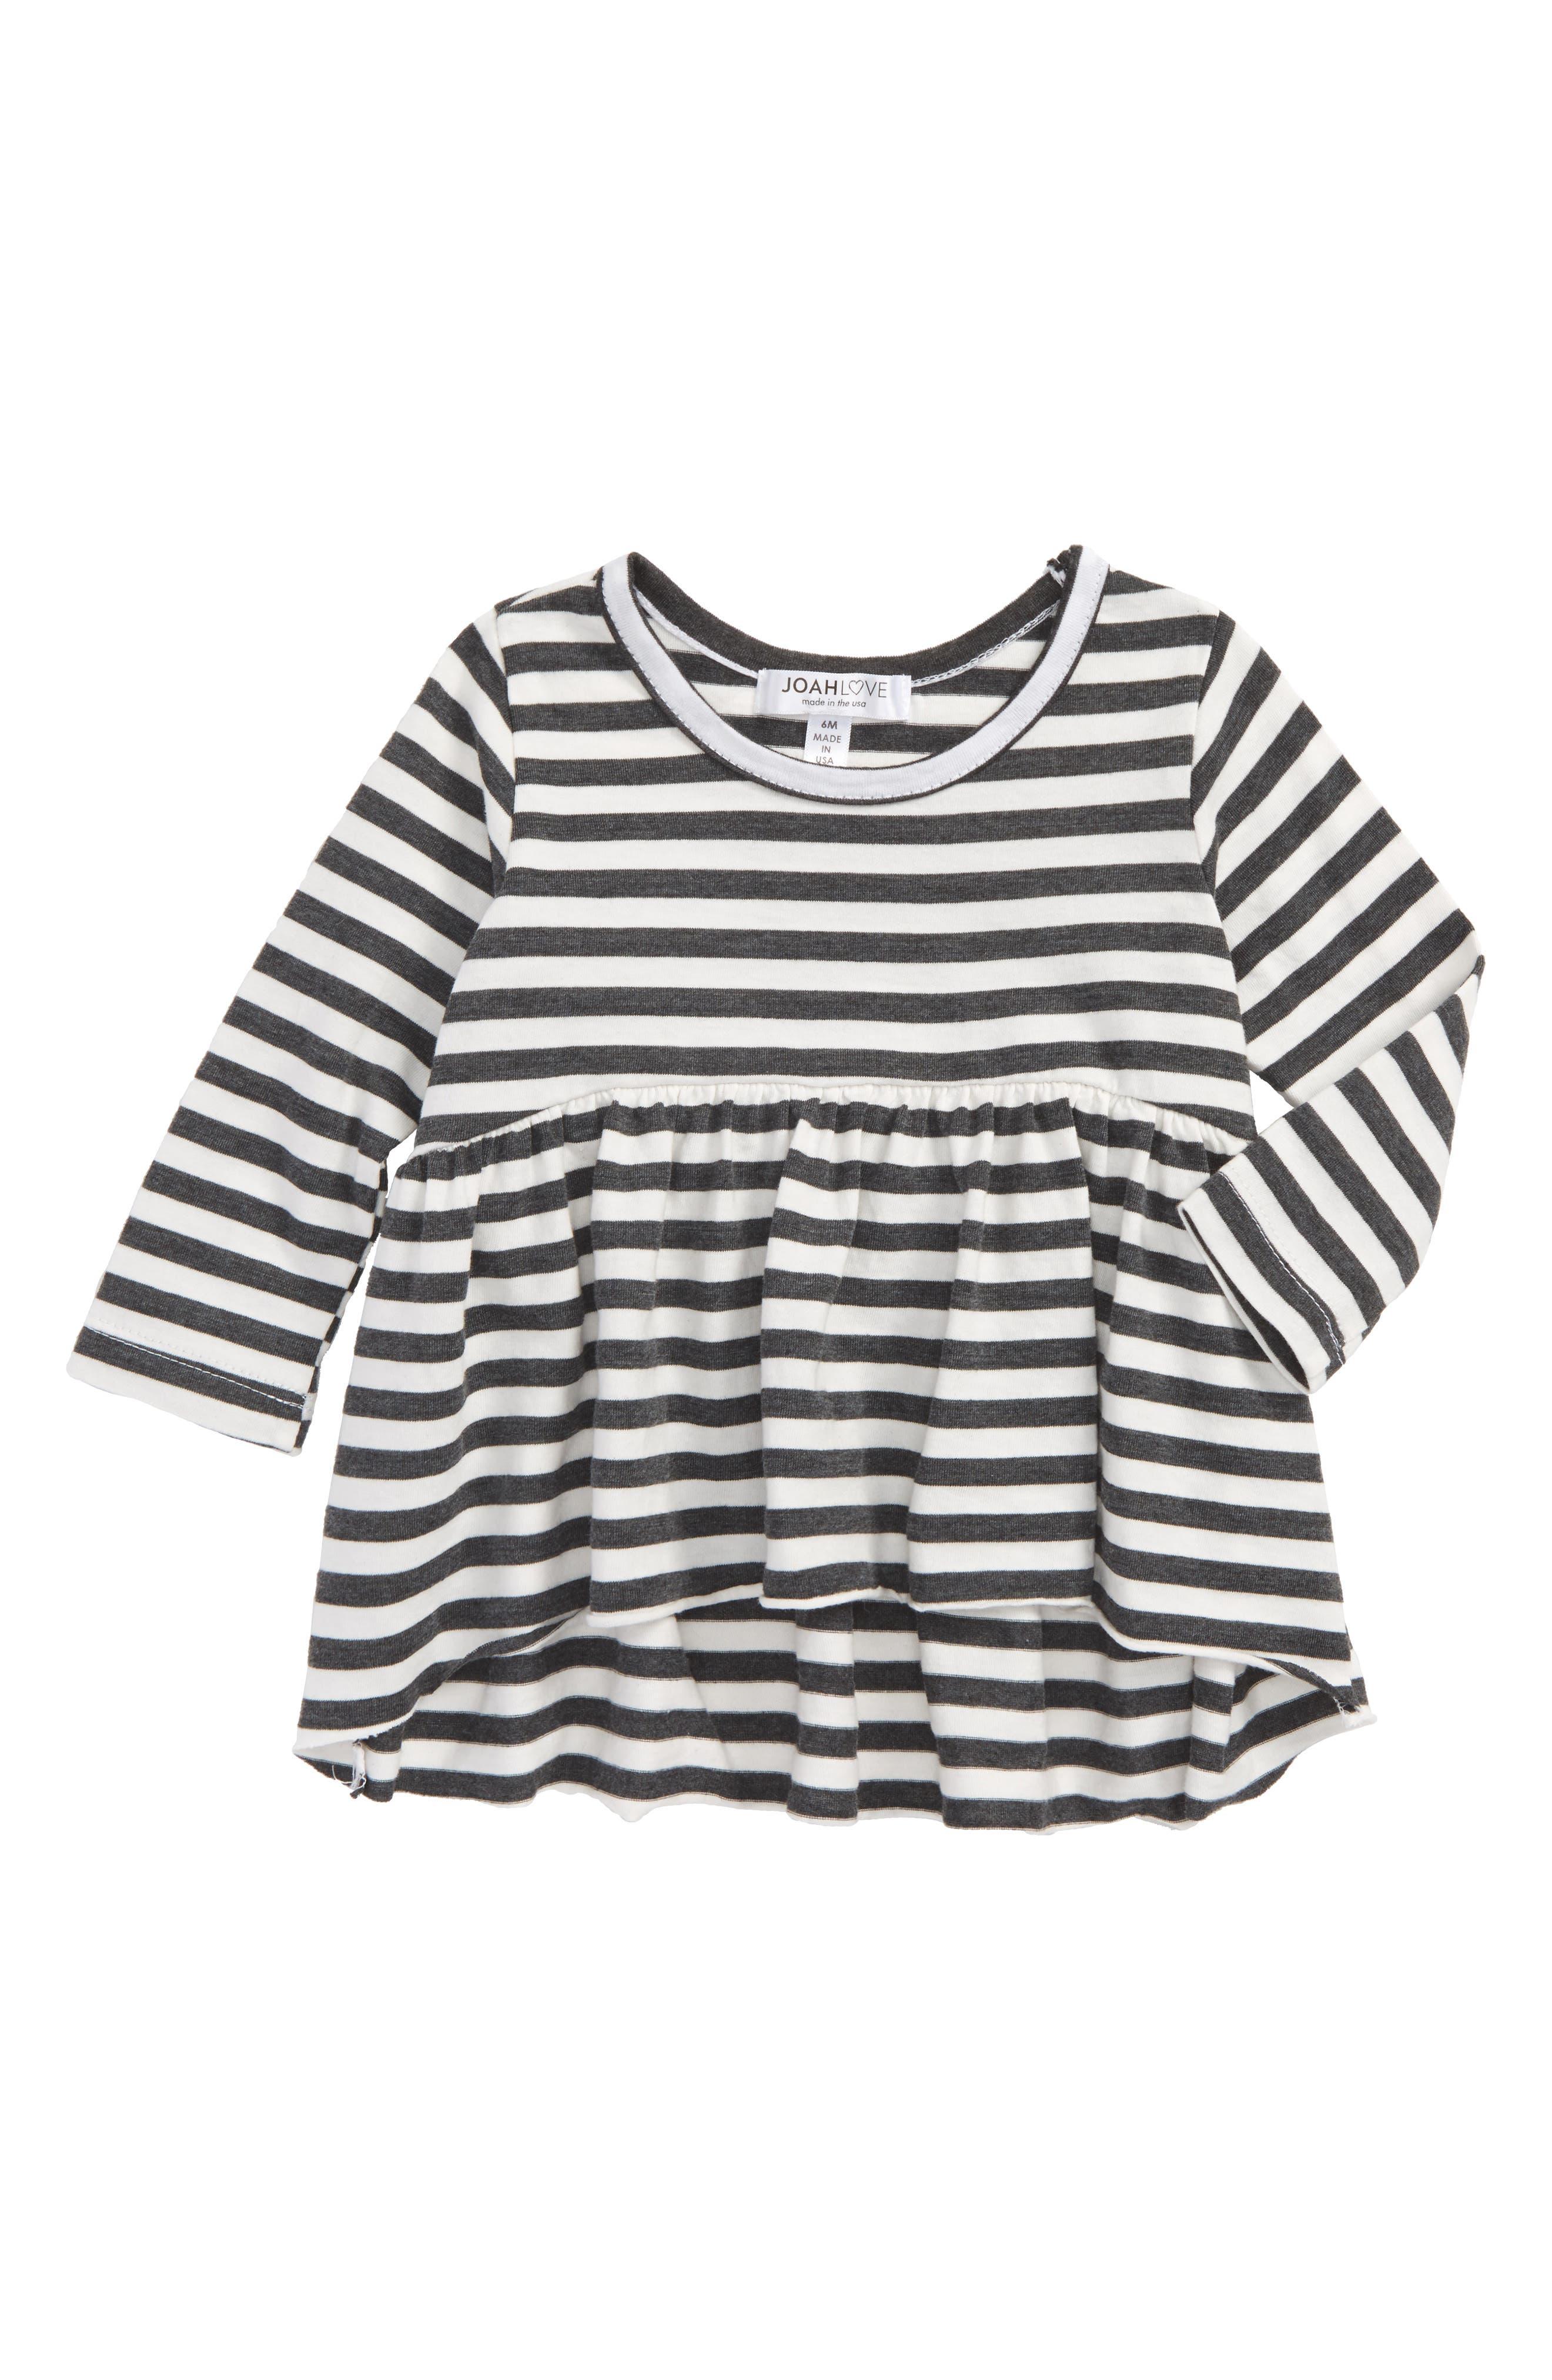 Stripe Peplum Tee,                         Main,                         color, Black/ White